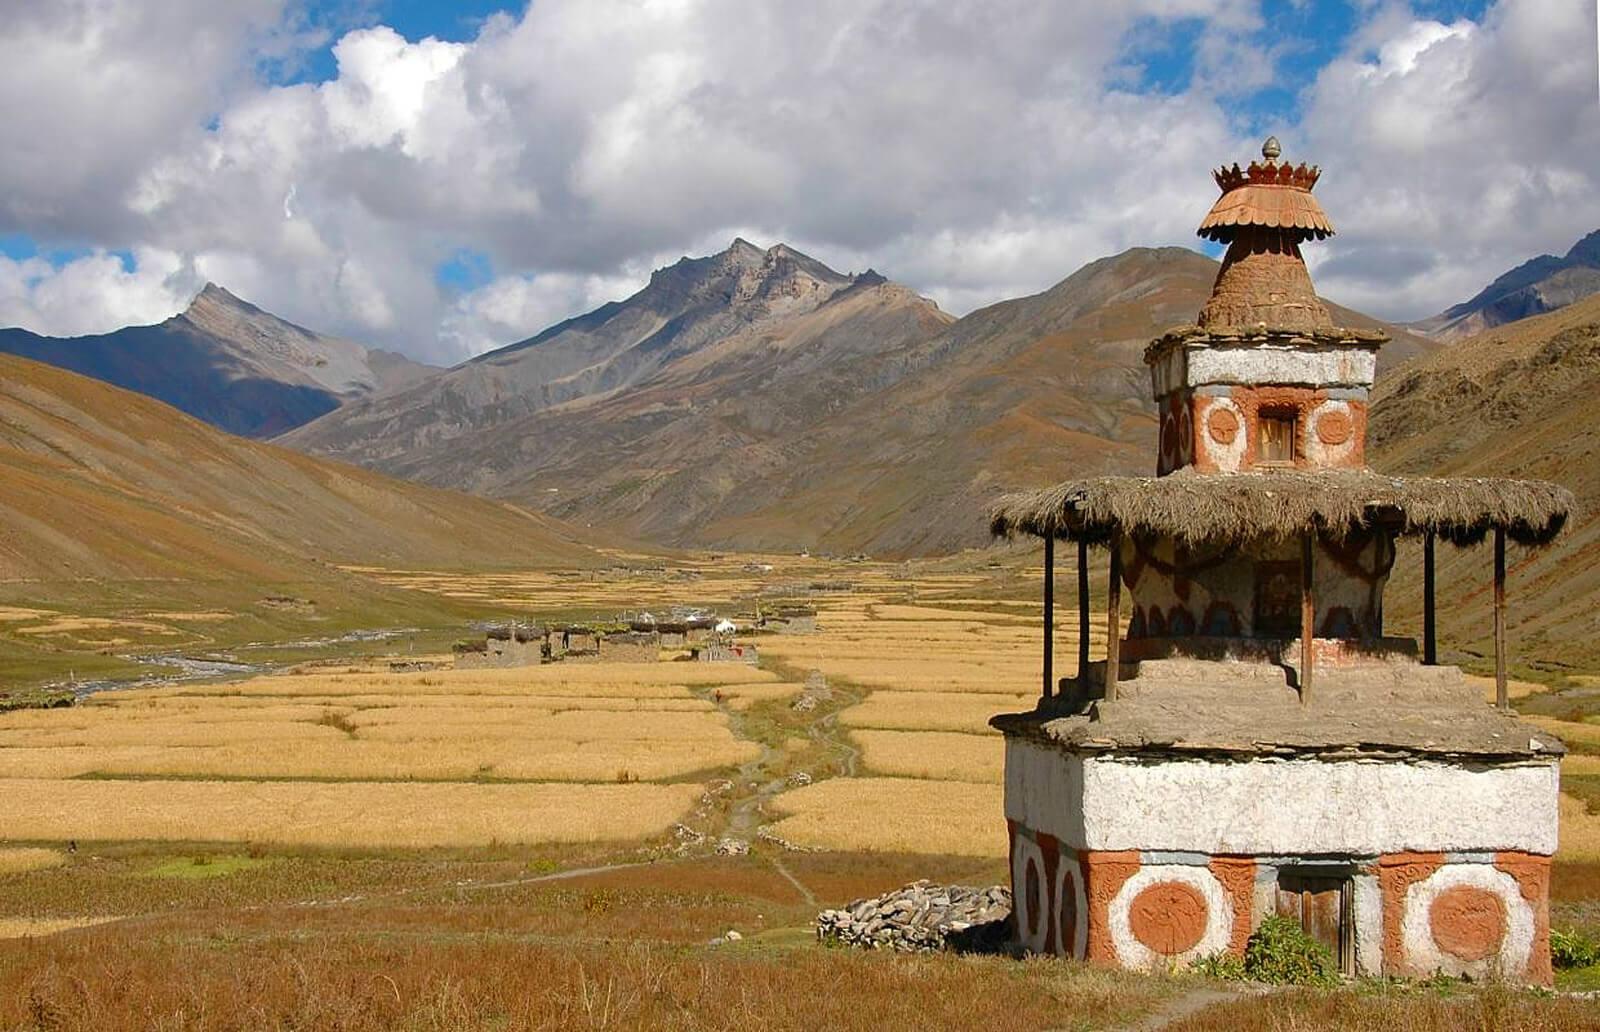 Upper Dolpo Region Trekking - Desert of Nepal